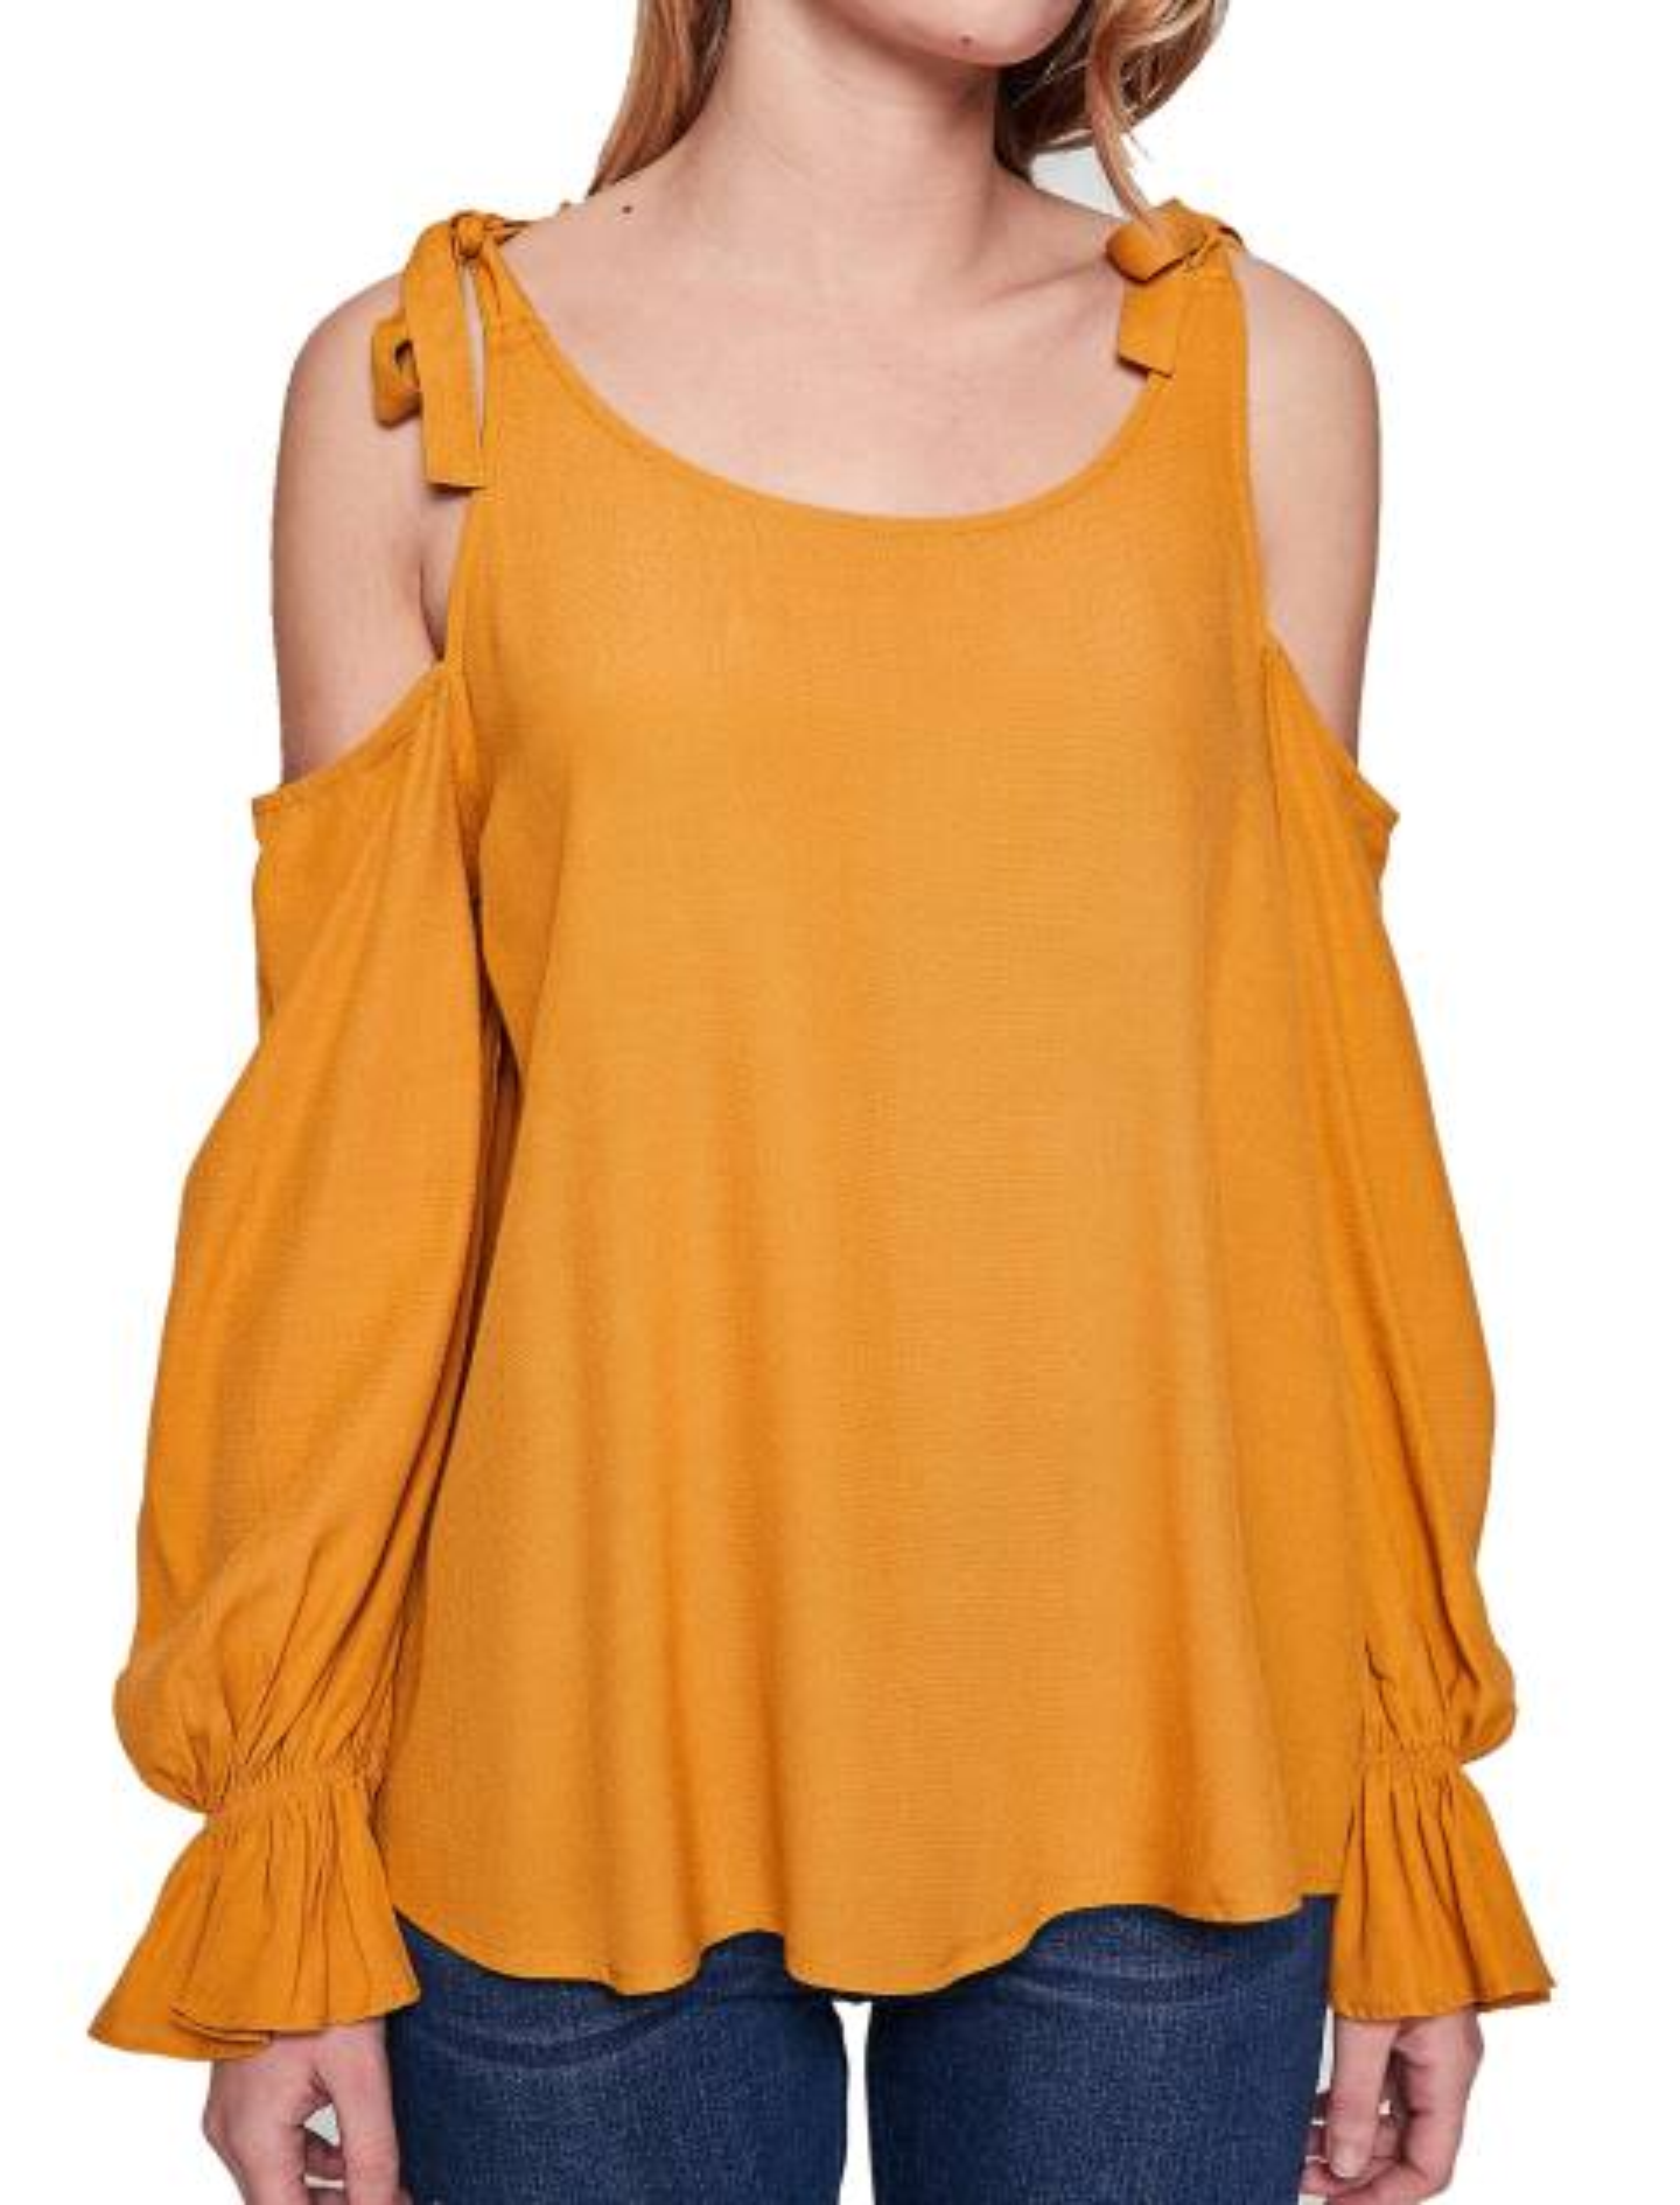 بلوز ویسکوز آستین بلند زنانه - نارنجي - 2